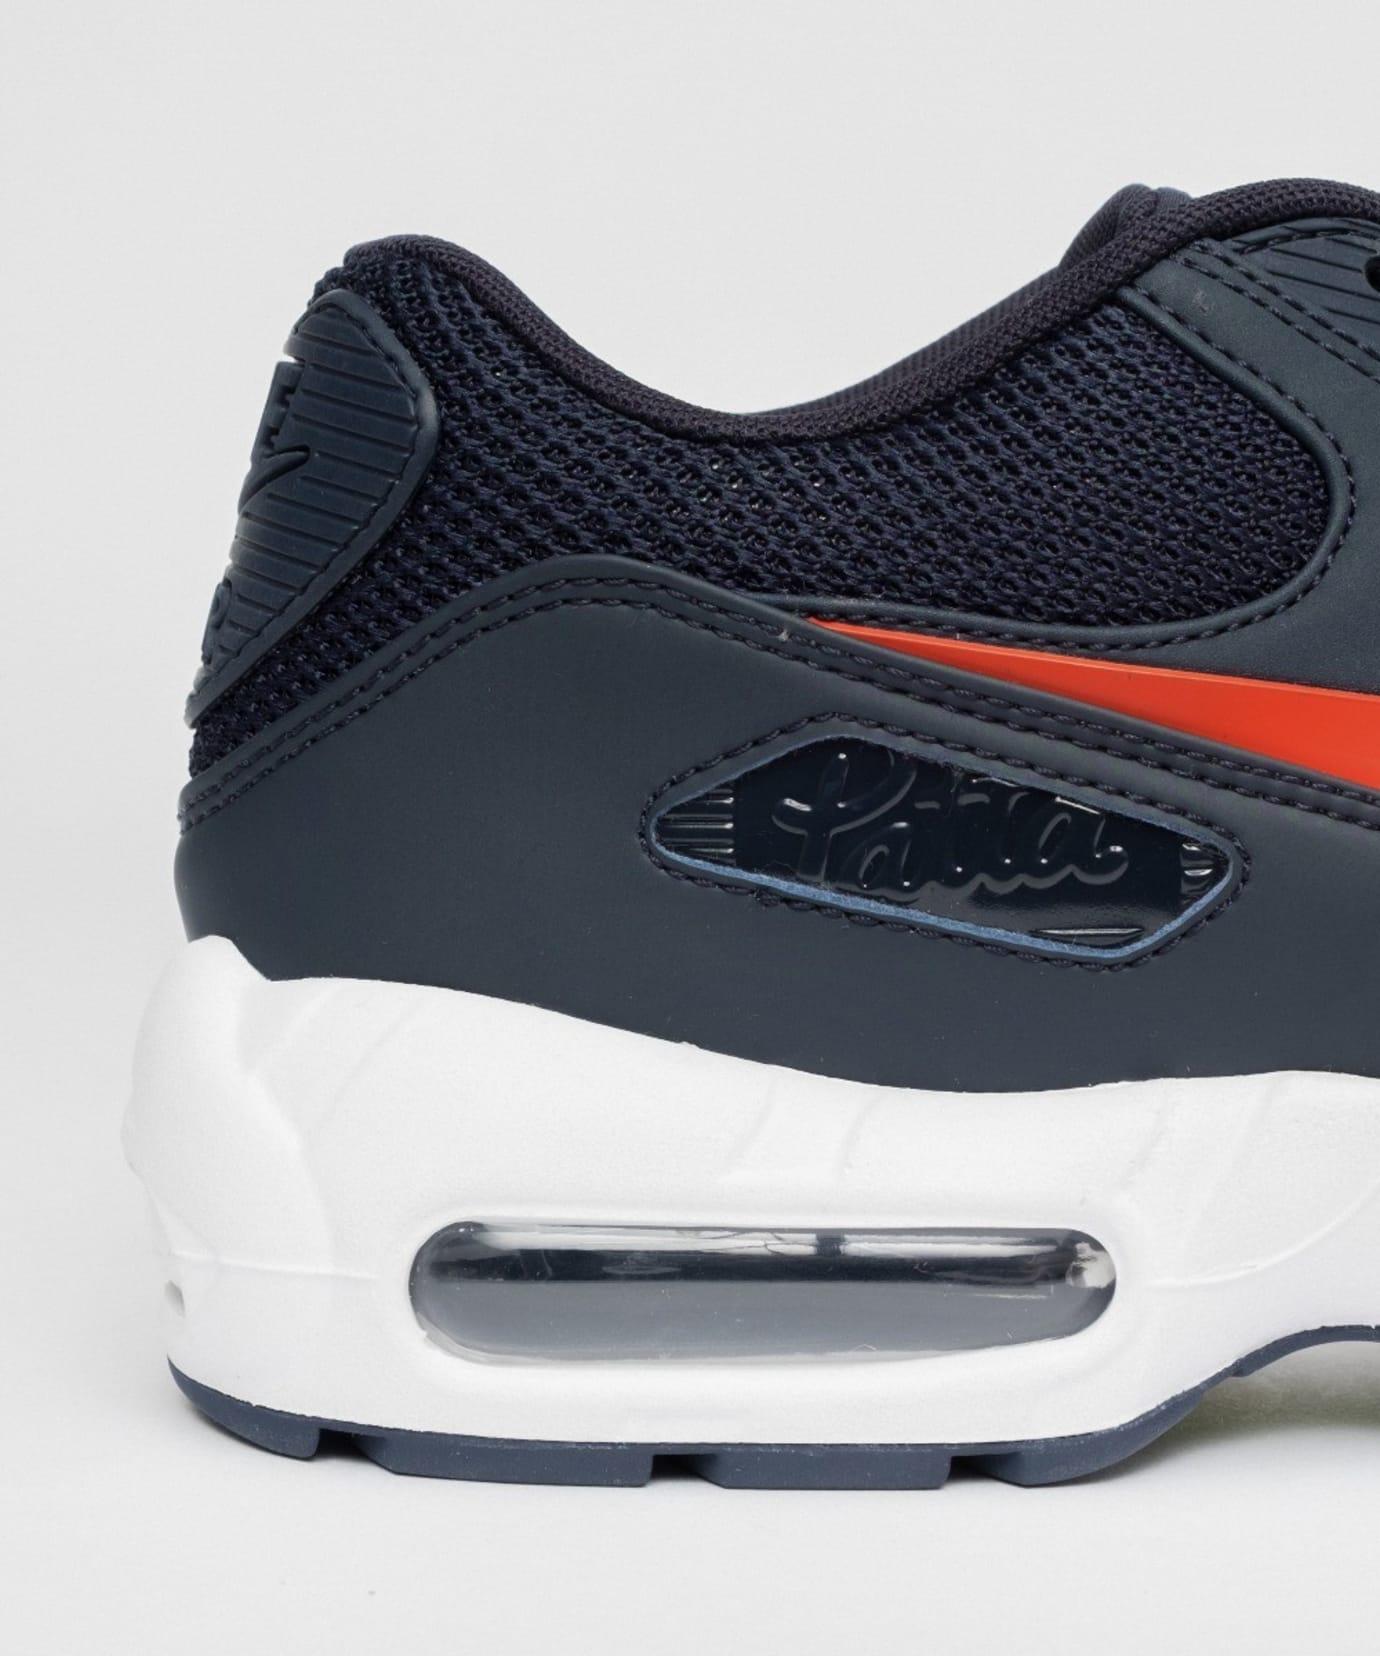 on sale c8bed 2ea65 Patta x Nike Air Max 90 x 95 'Publicity. Publicity ...